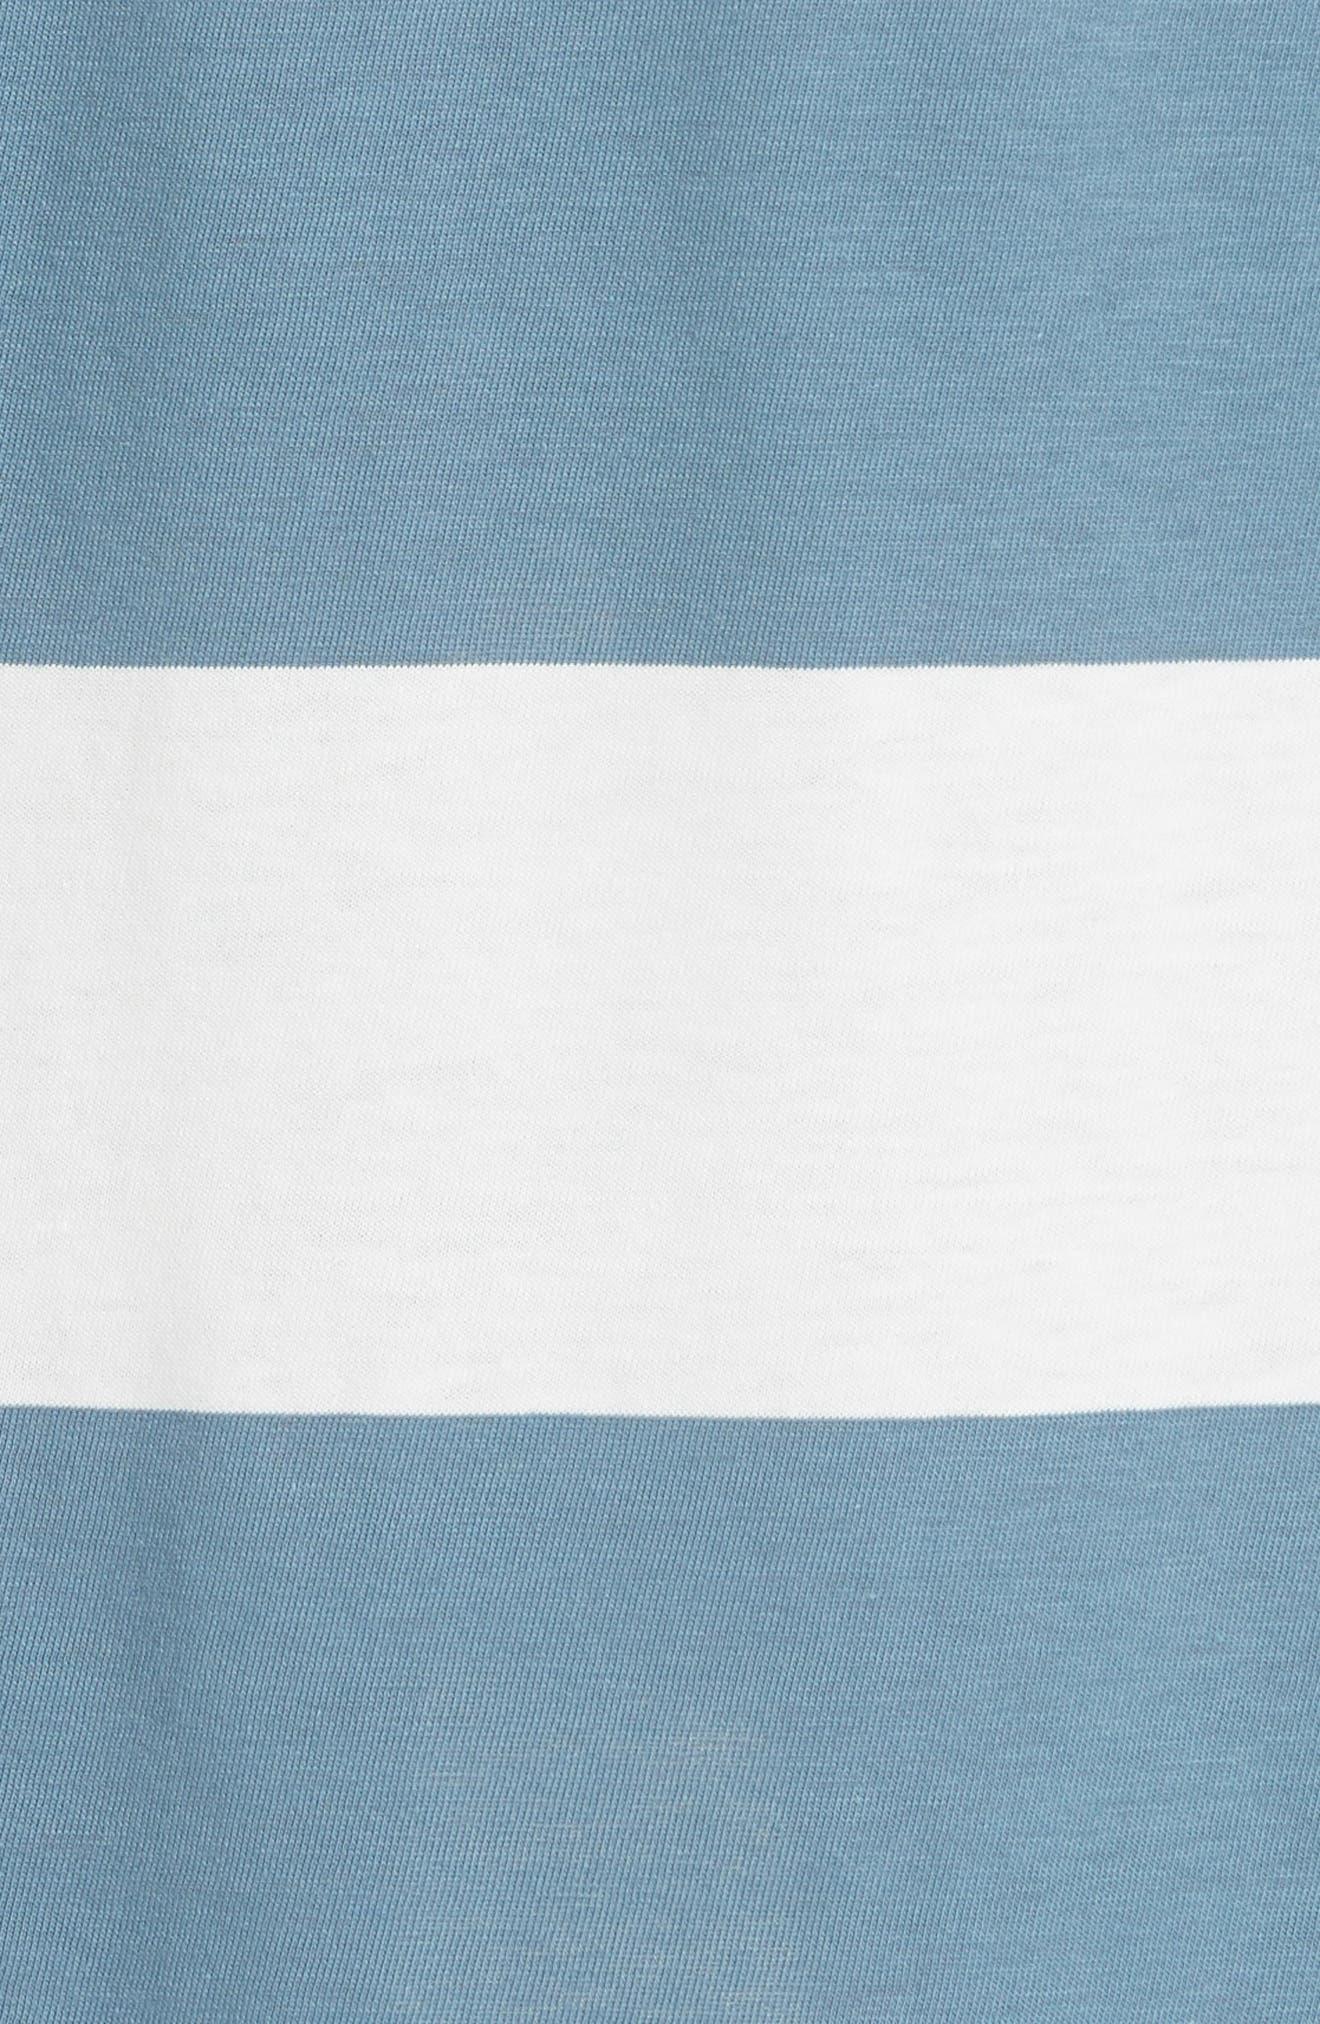 Stripe Mercerized Jersey Dress,                             Alternate thumbnail 5, color,                             CHALK/ PRUSSIAN